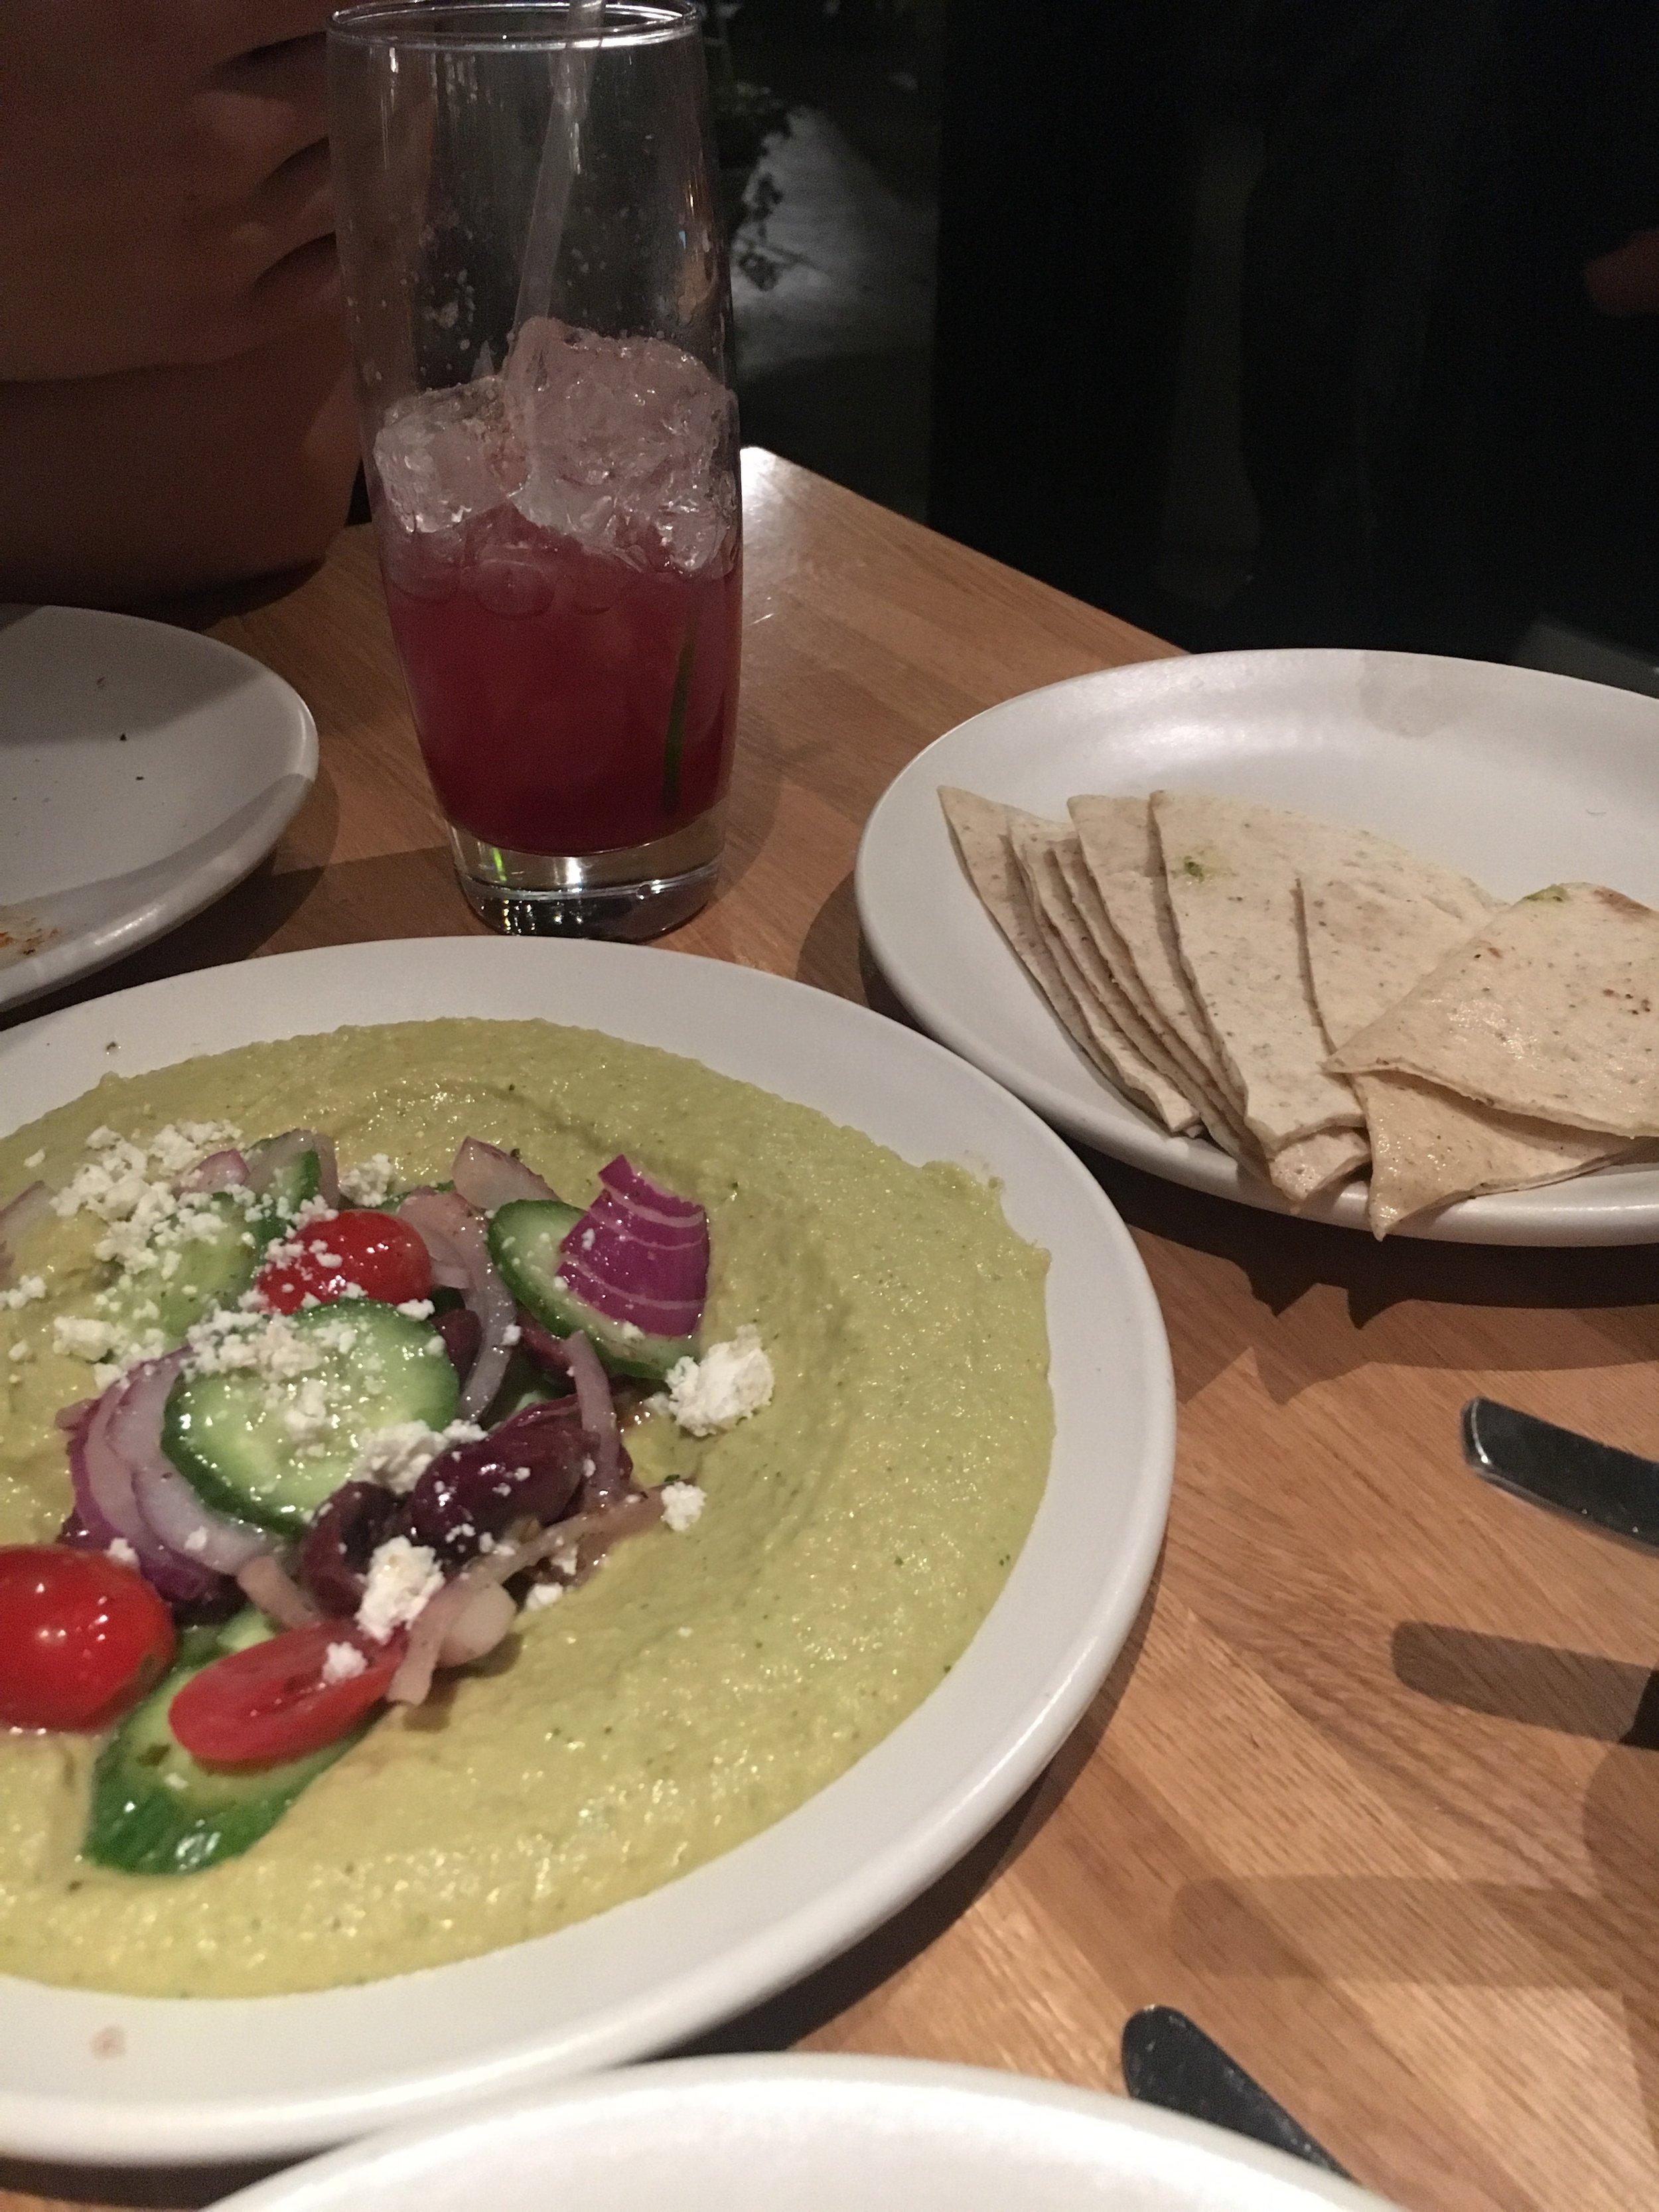 Herb Hummus (VEG) - Hold the feta please.